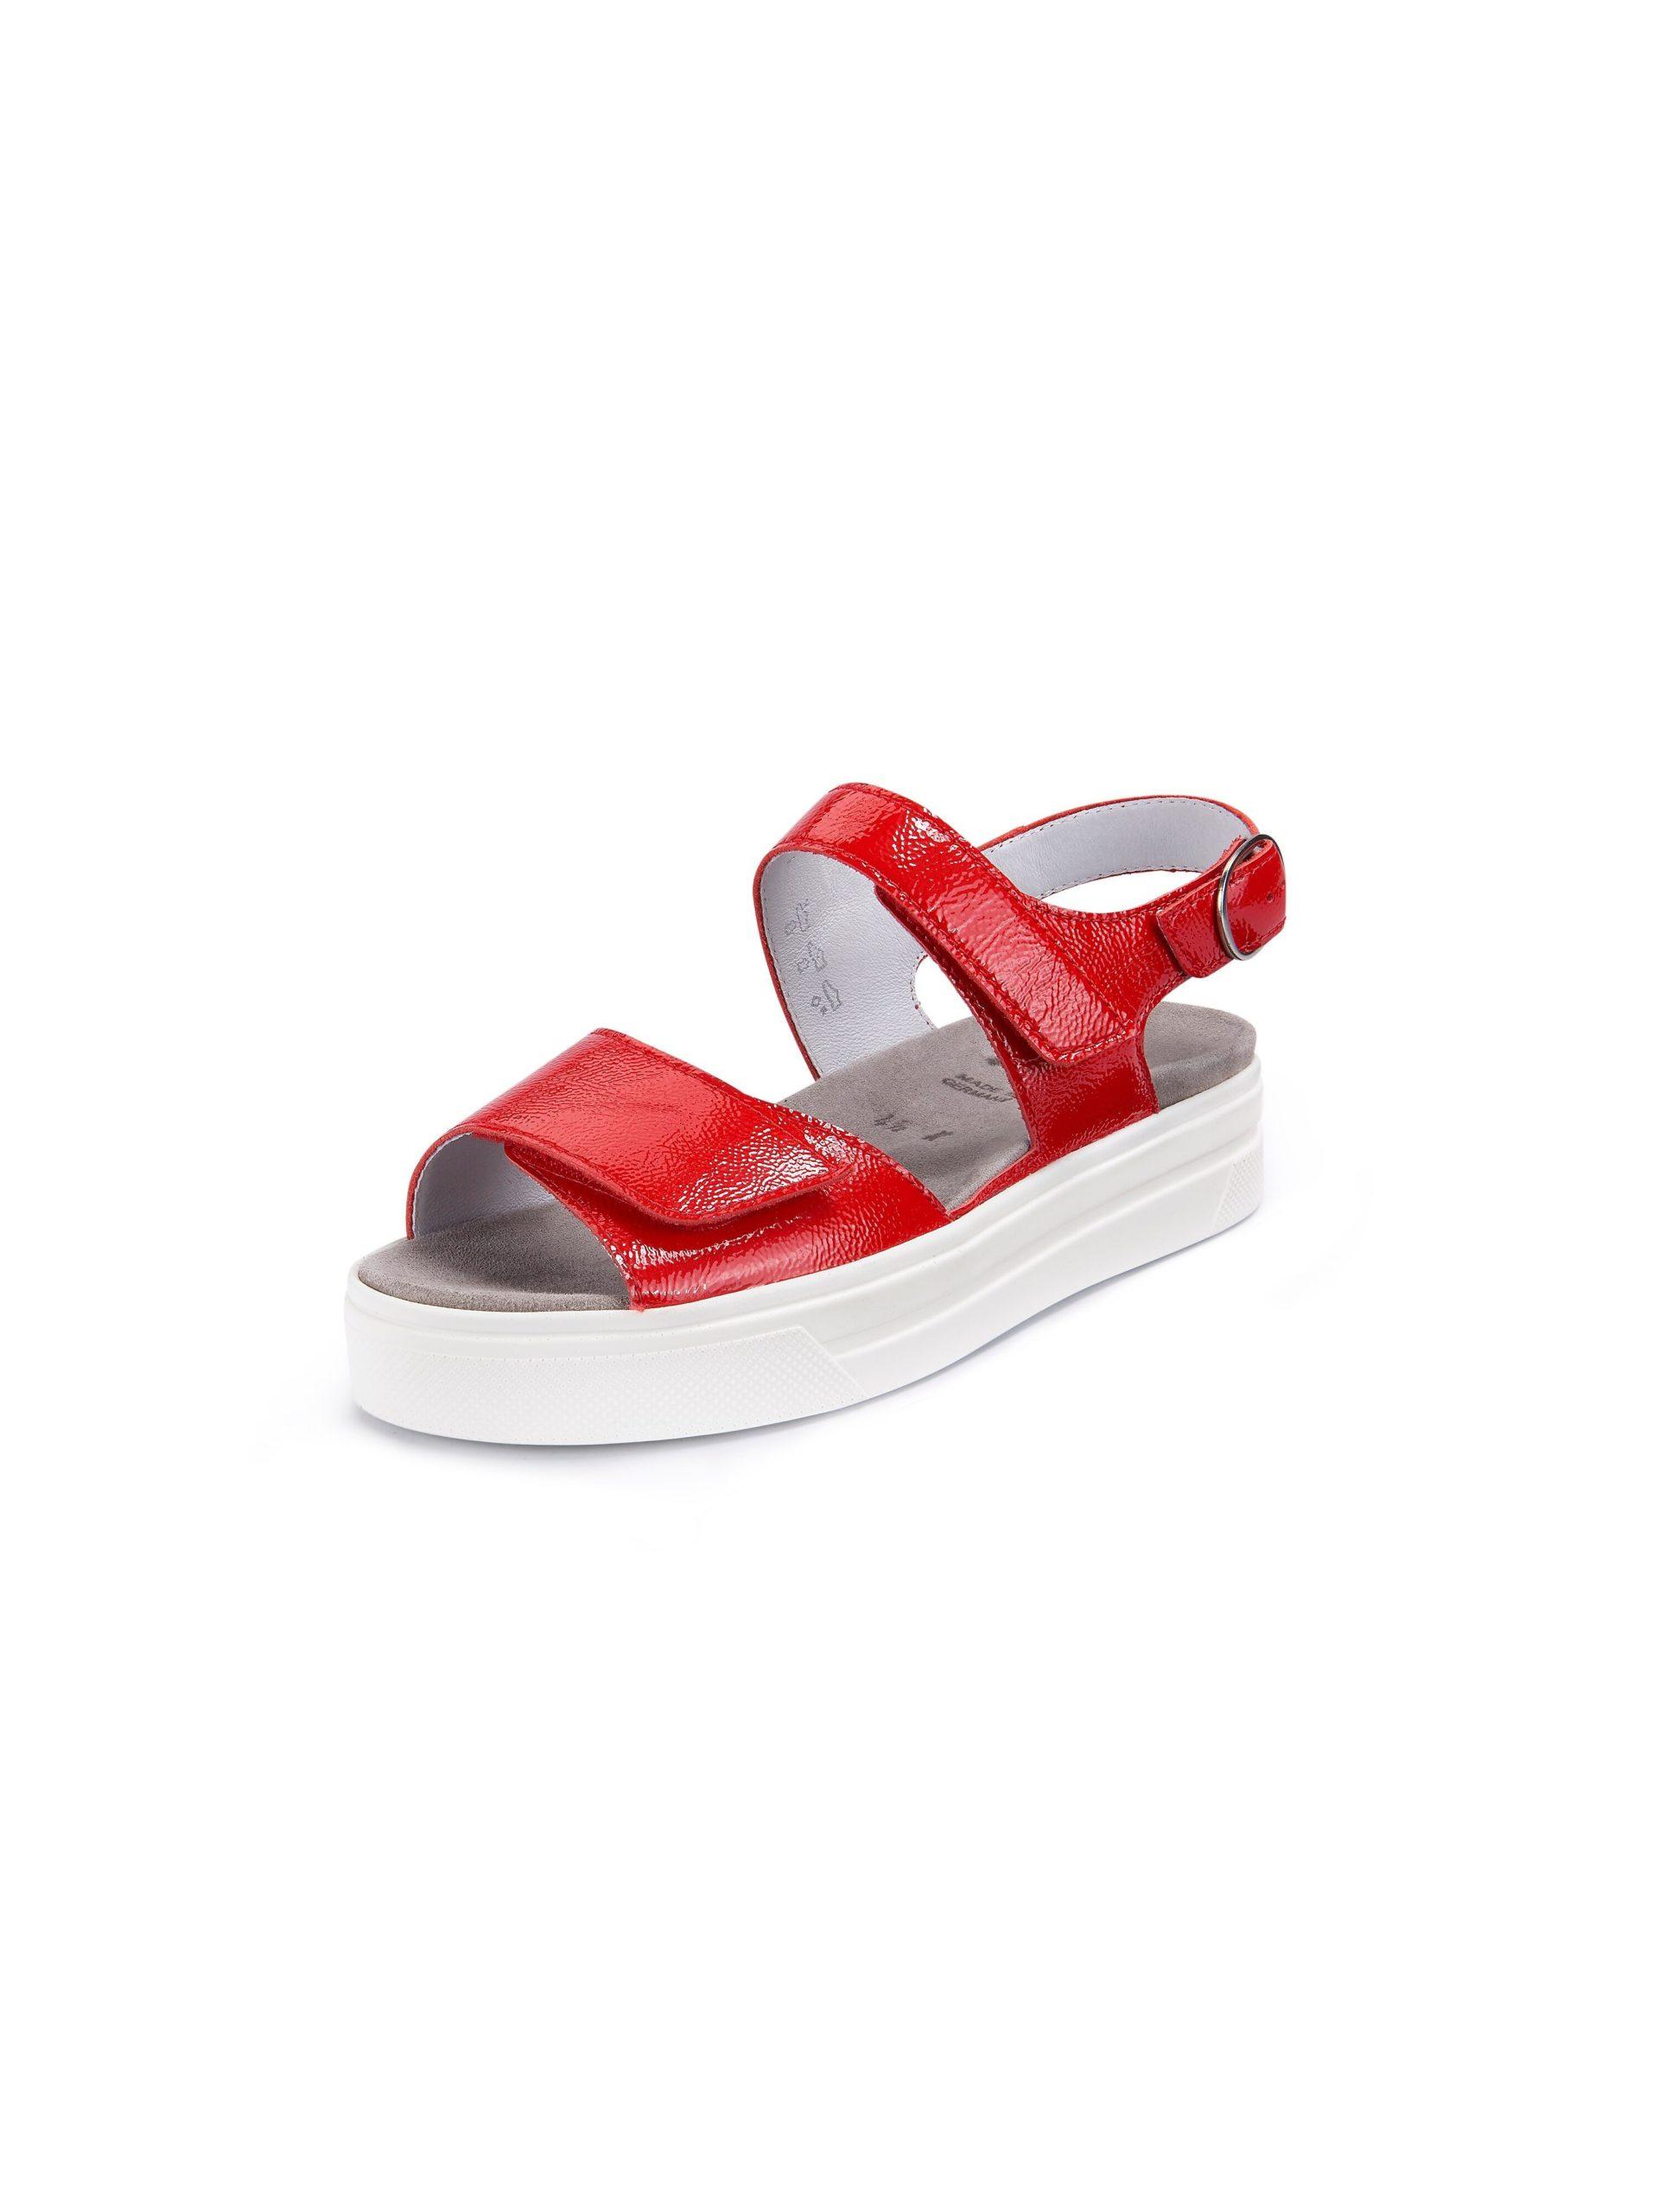 Plateau-sandalen Van Semler rood Kopen